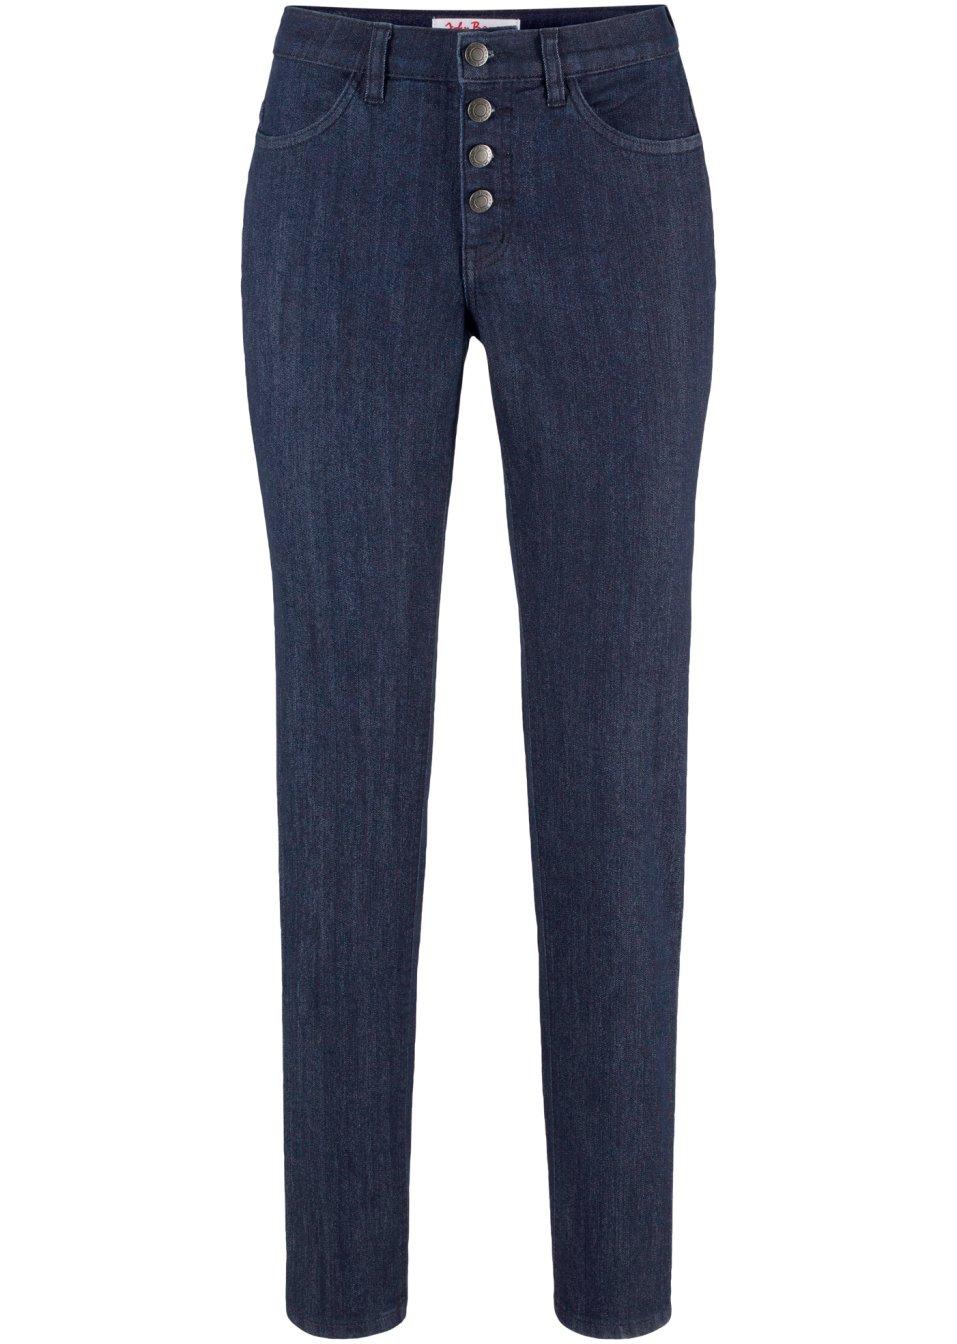 Basic-Komfort-Stretch-Jeans - dunkelblau Normal F3RpZ n7Nh1